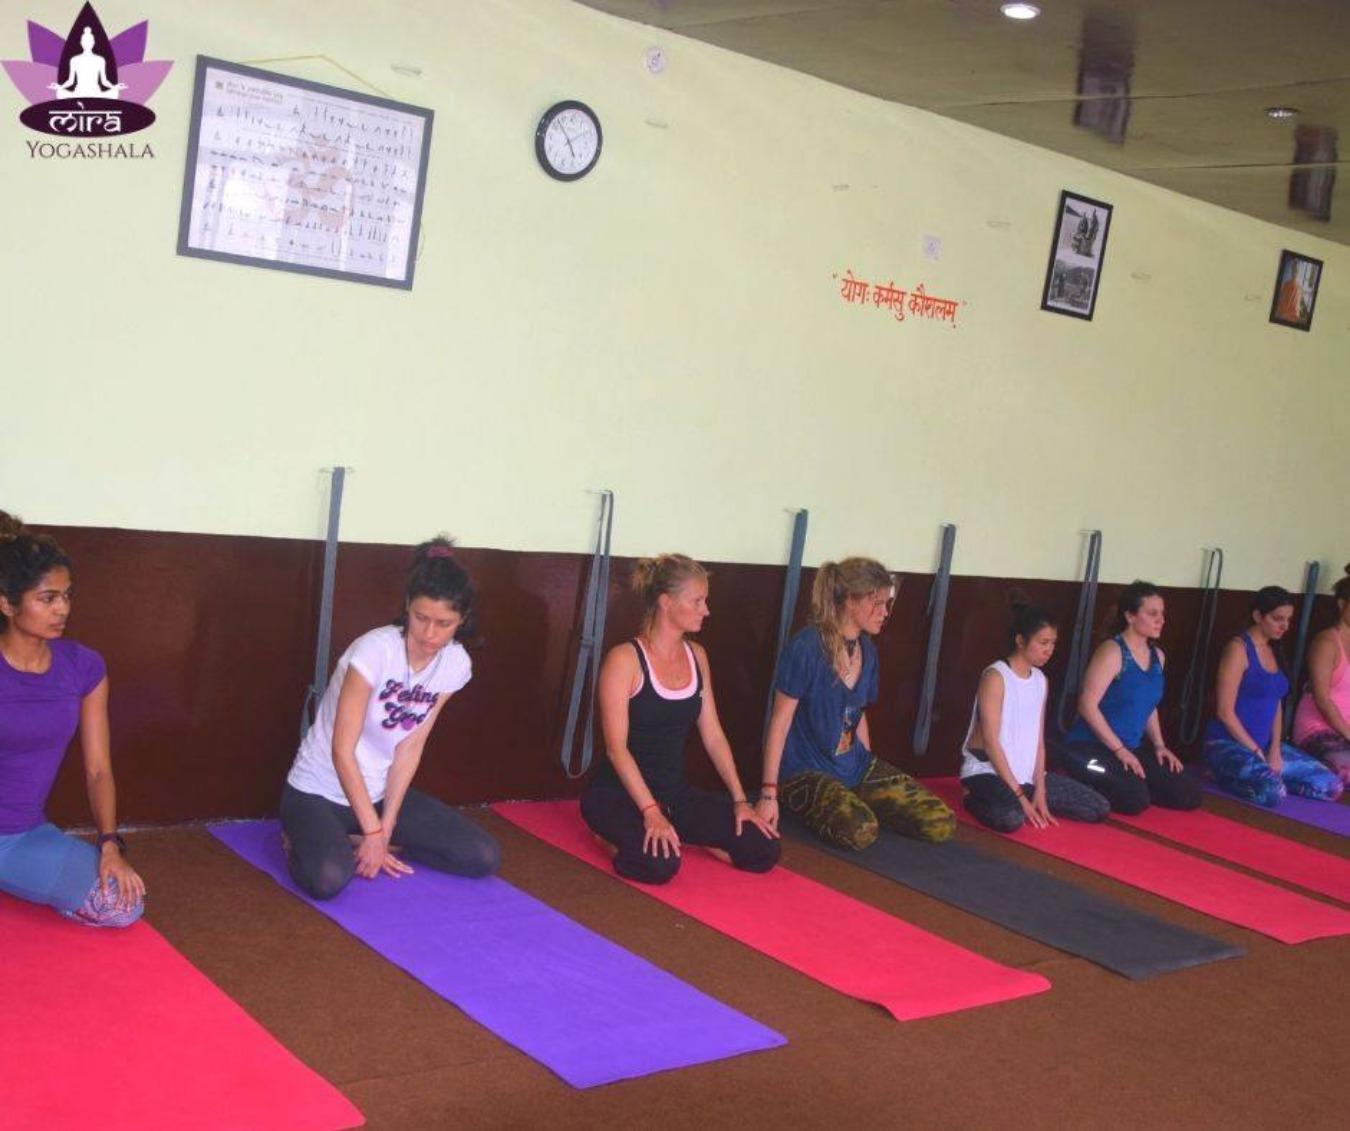 One week Yoga Retreat in Rishikesh, India Tickets by Mira Yogashala, 6 Sep,  2019, Rishikesh Event